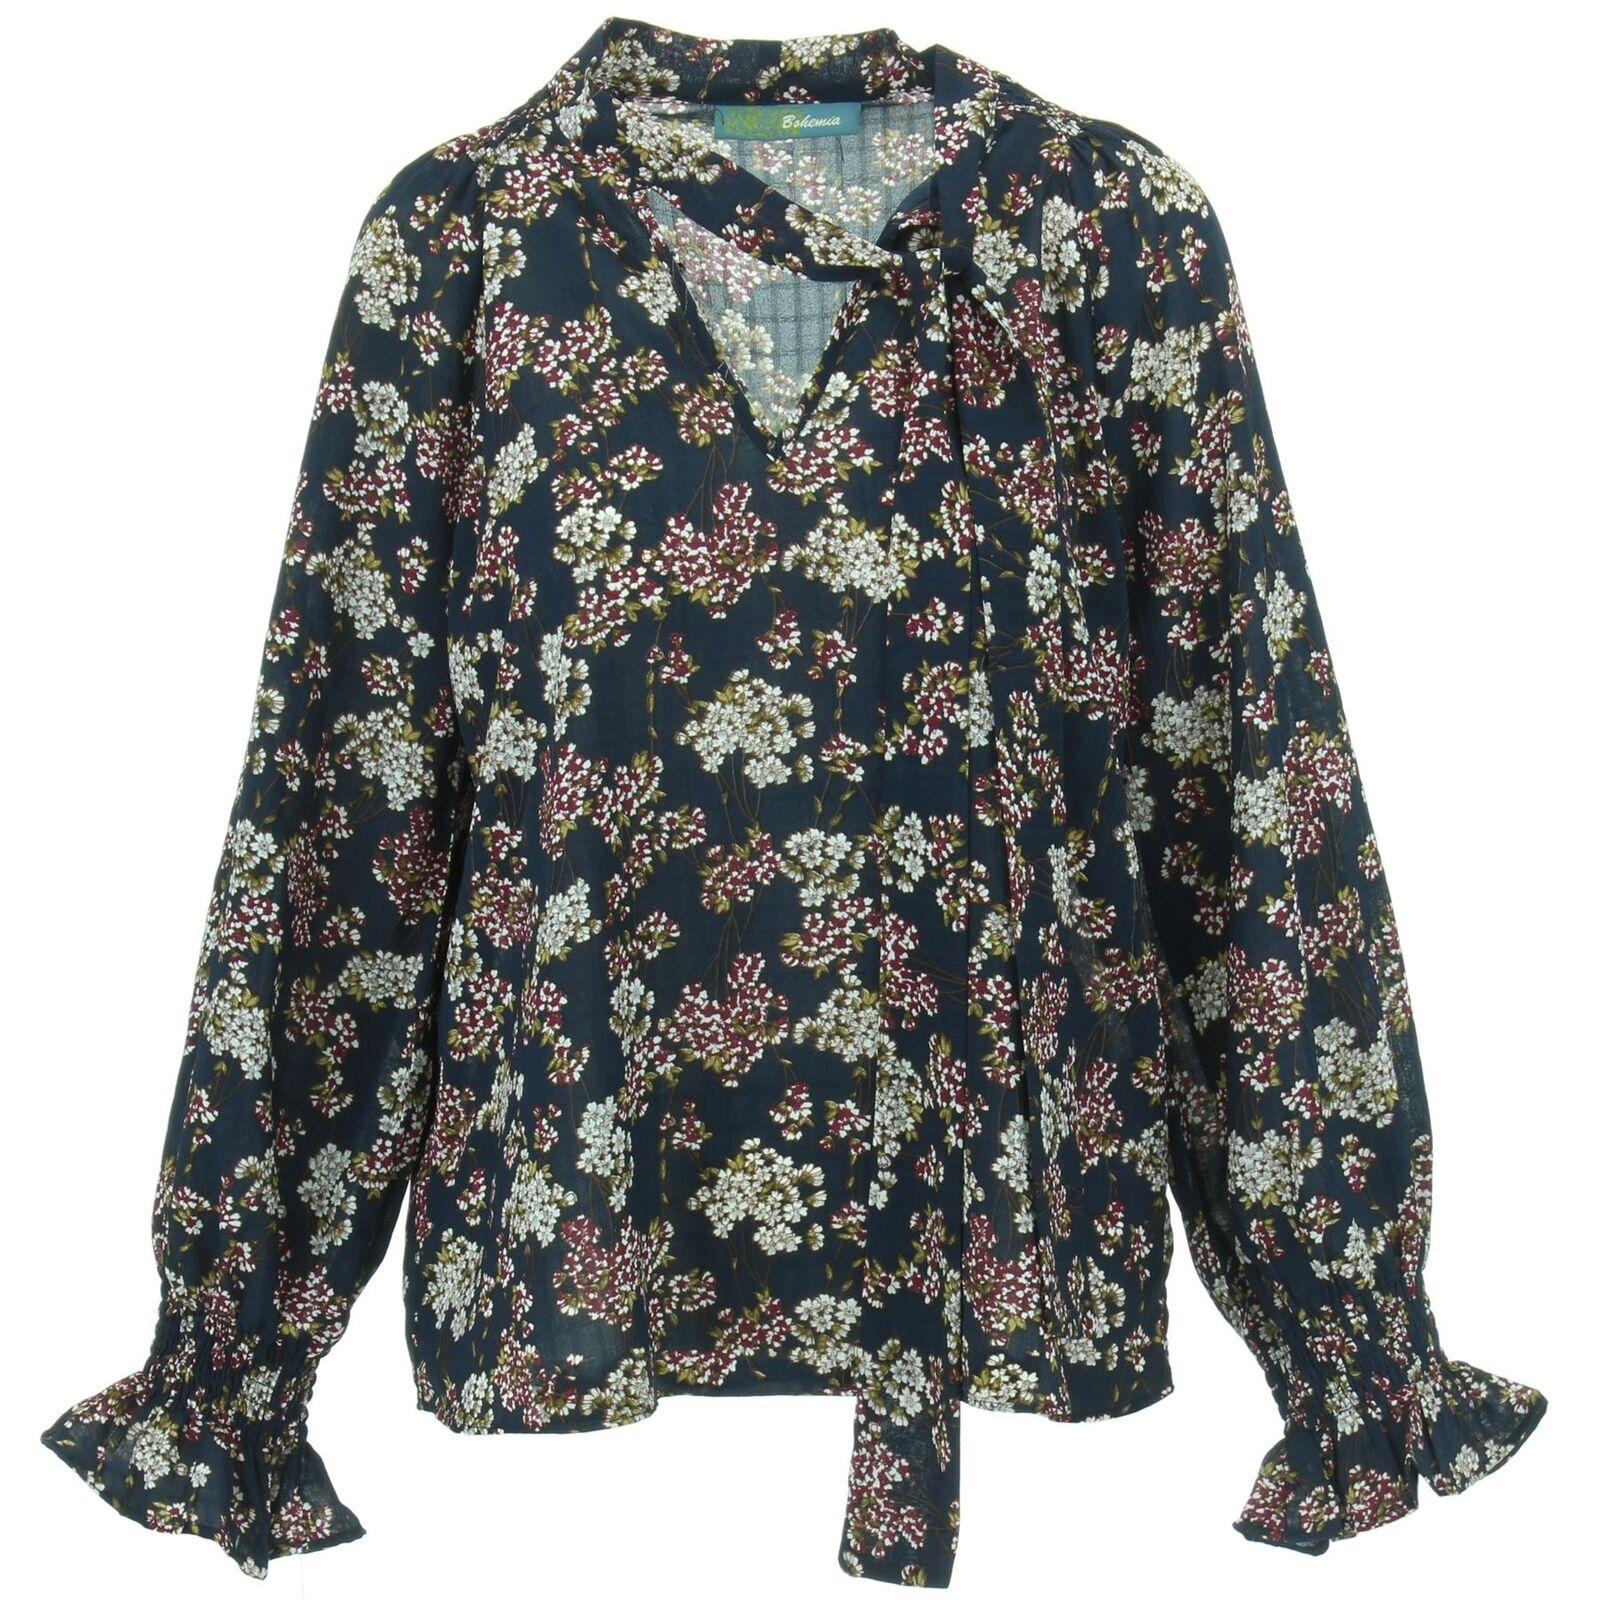 Shirt Blouse Floral V Neck Tie Ruffled Cuffs BOHEMIA damen Ladies